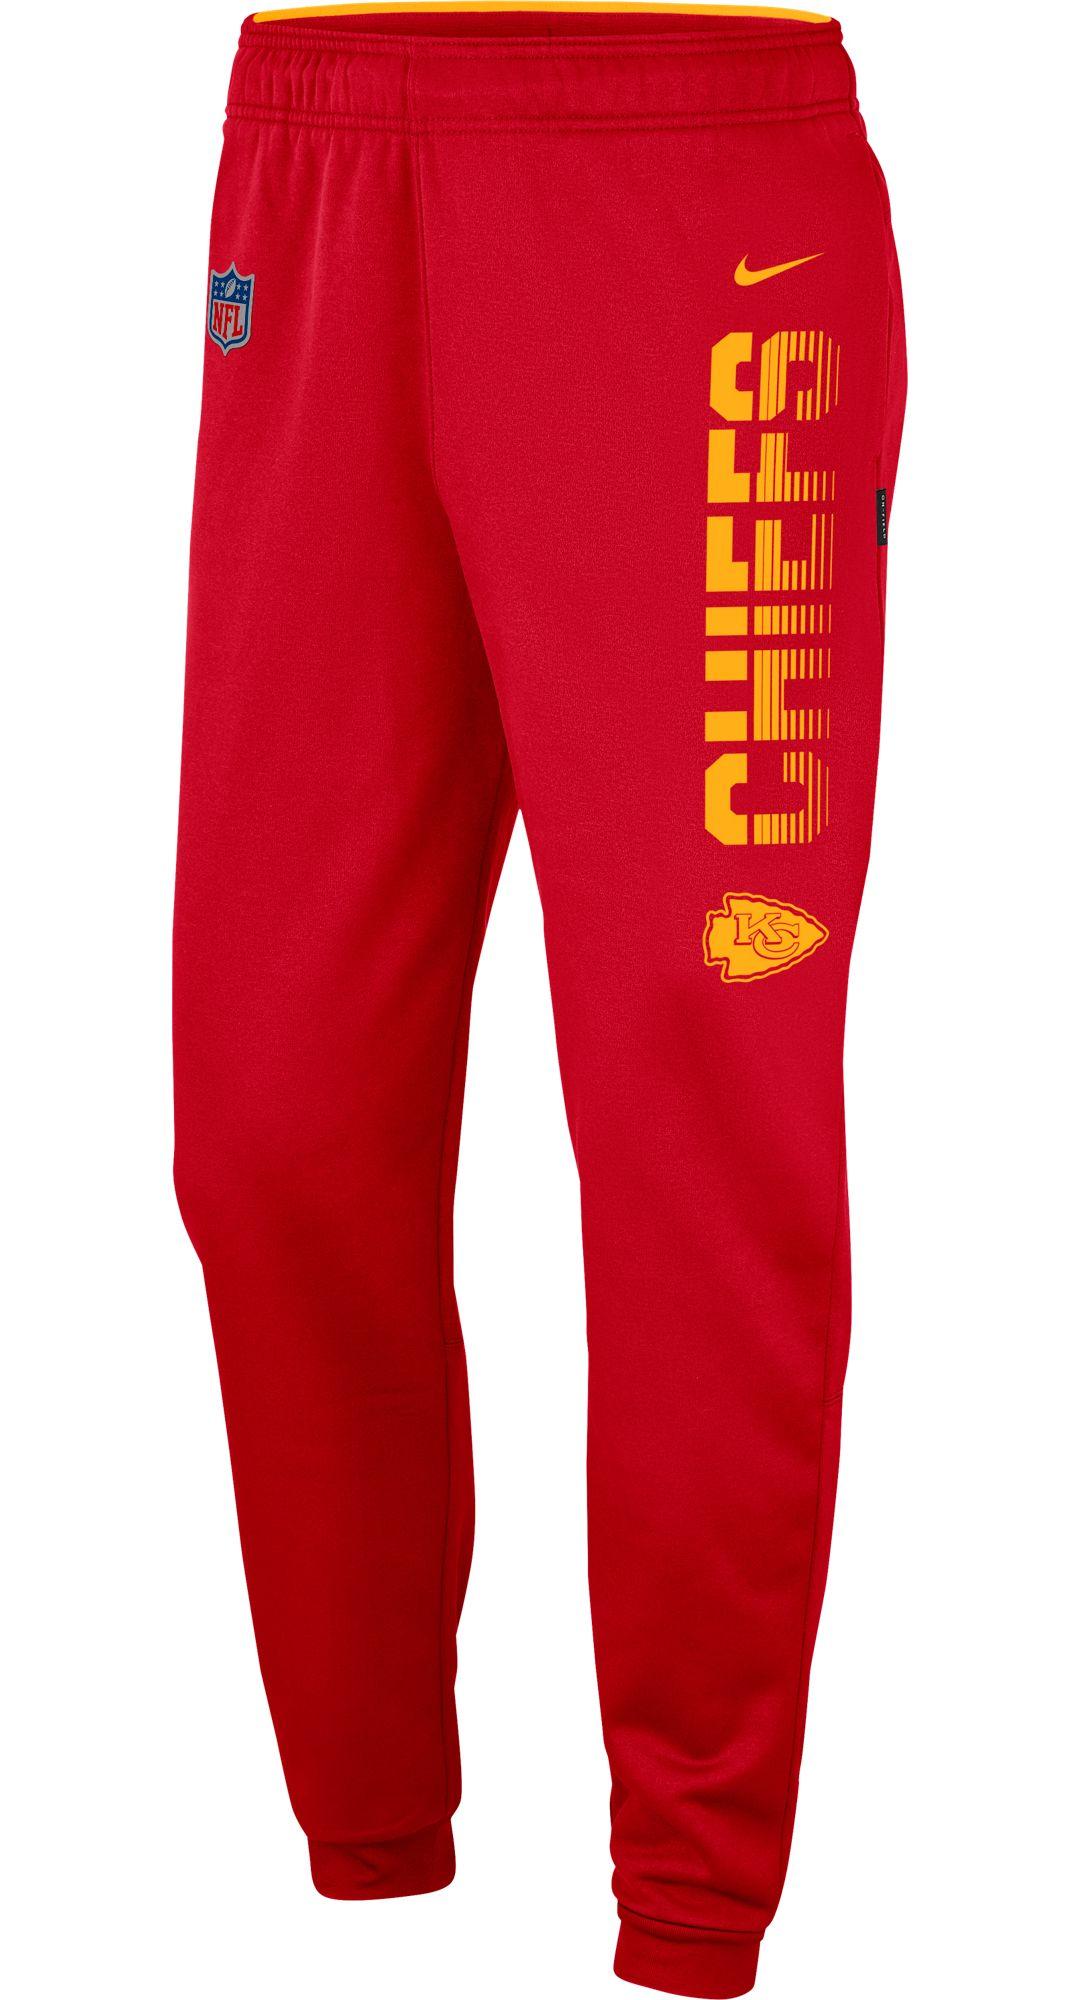 4b2ebb58 Nike Men's Kansas City Chiefs Sideline Therma-FIT Performance Red Pants